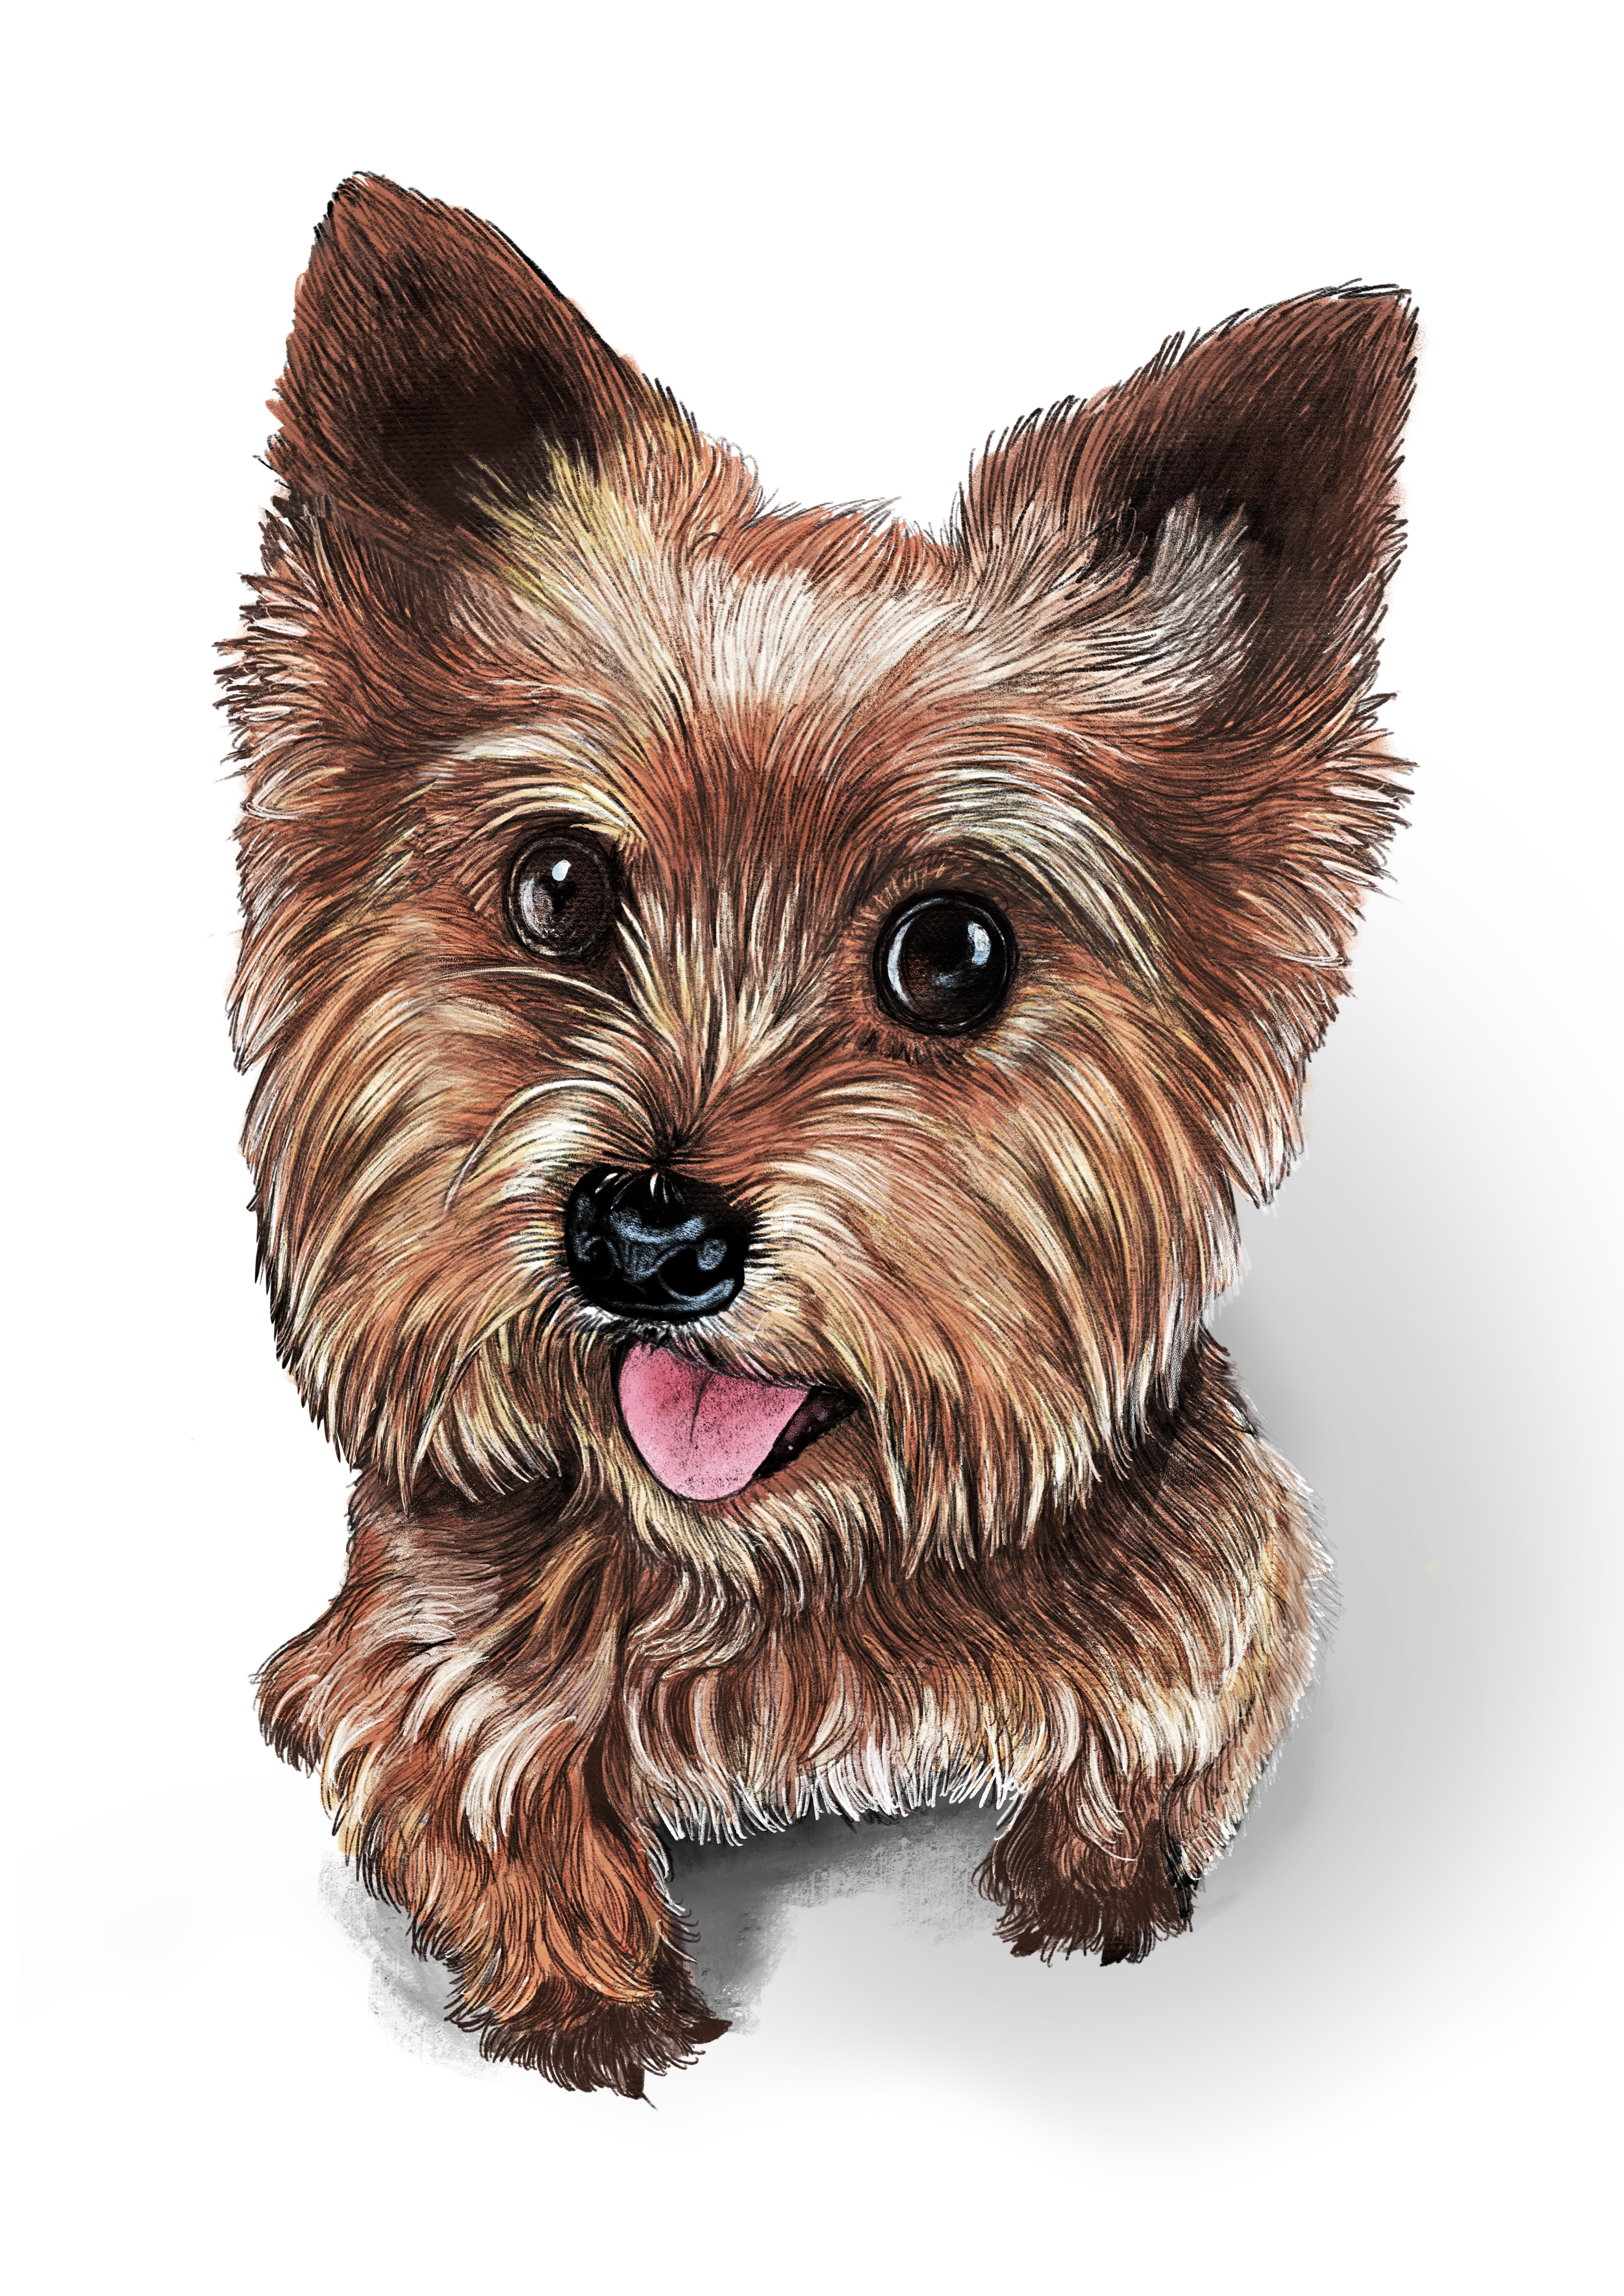 Illustration of my pet yorkshire terrier dog